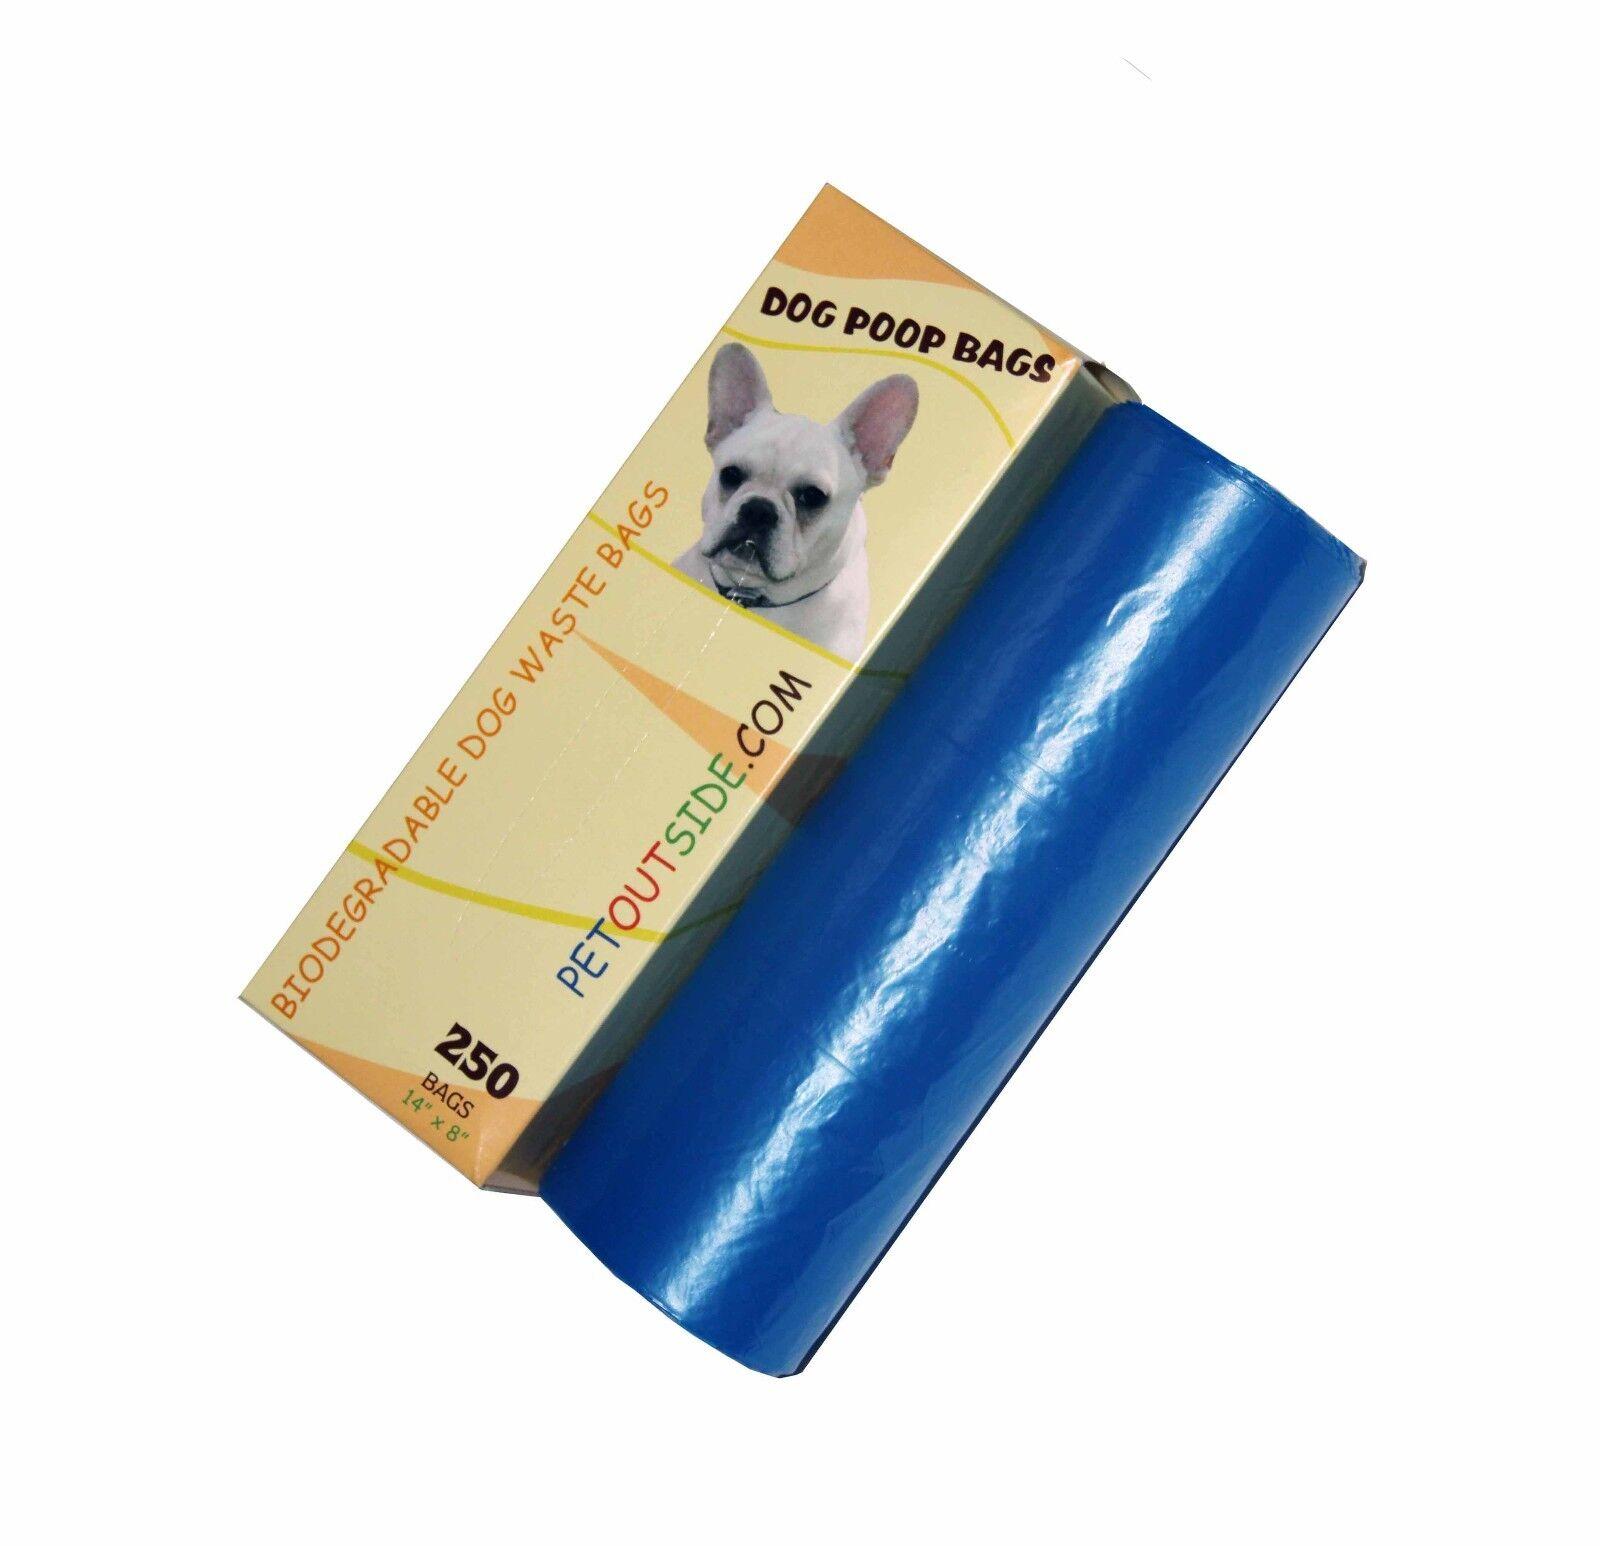 5000 Dog Dog Dog Pet Waste Poop Bags 20 Rolls Strong .75 mil 19 mcrns easy separate blu d8173a